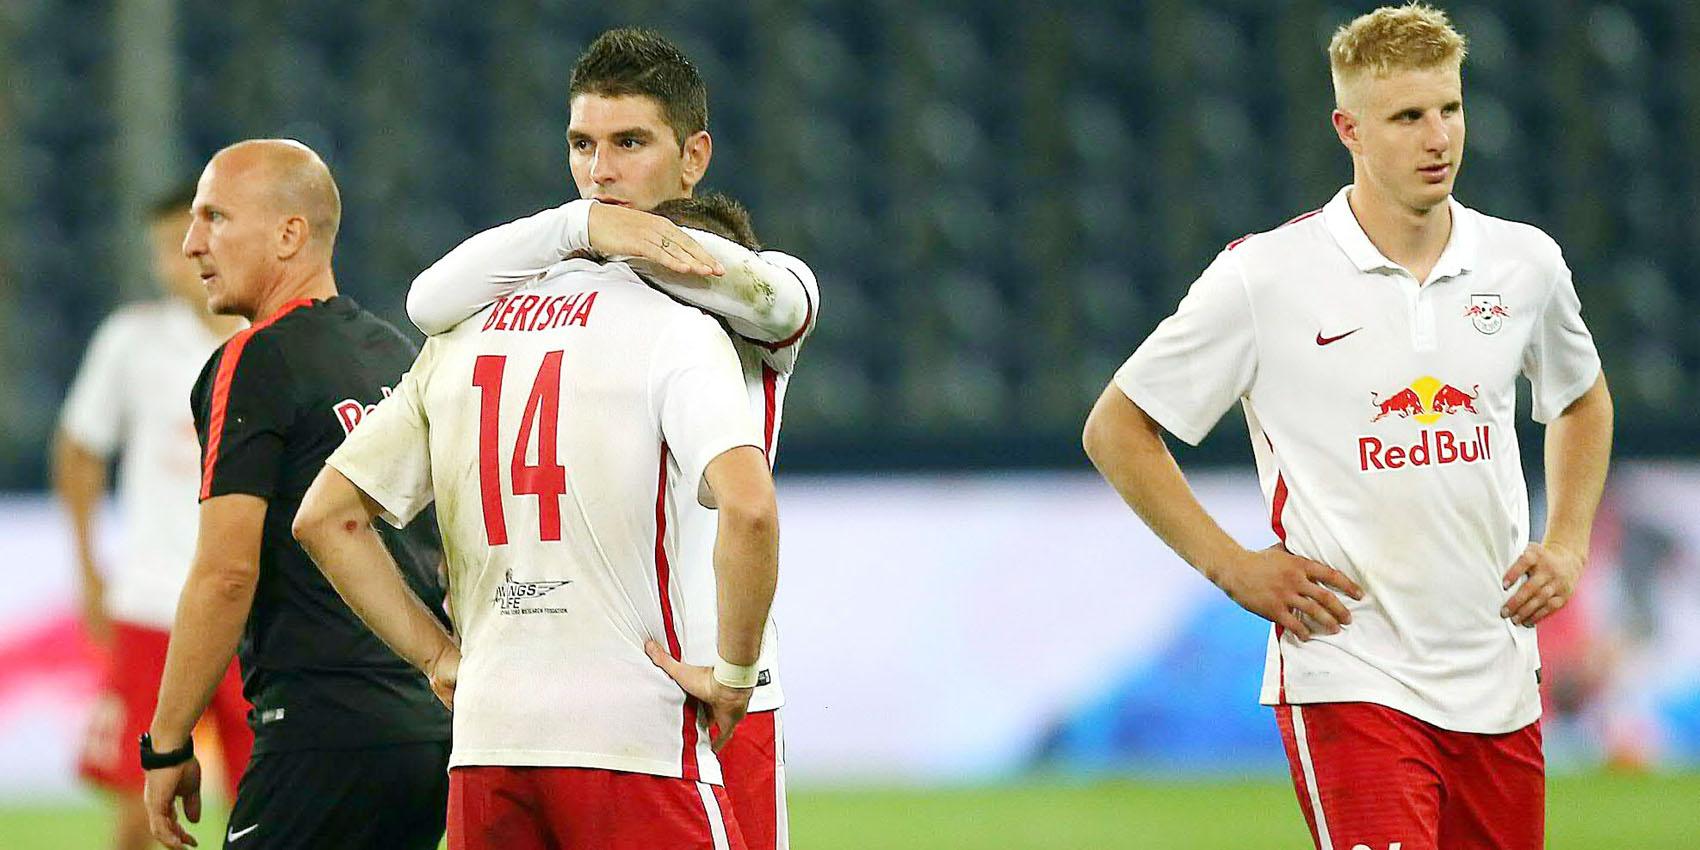 Salzburger Spieler sind über den Betriebsrat enttäuscht